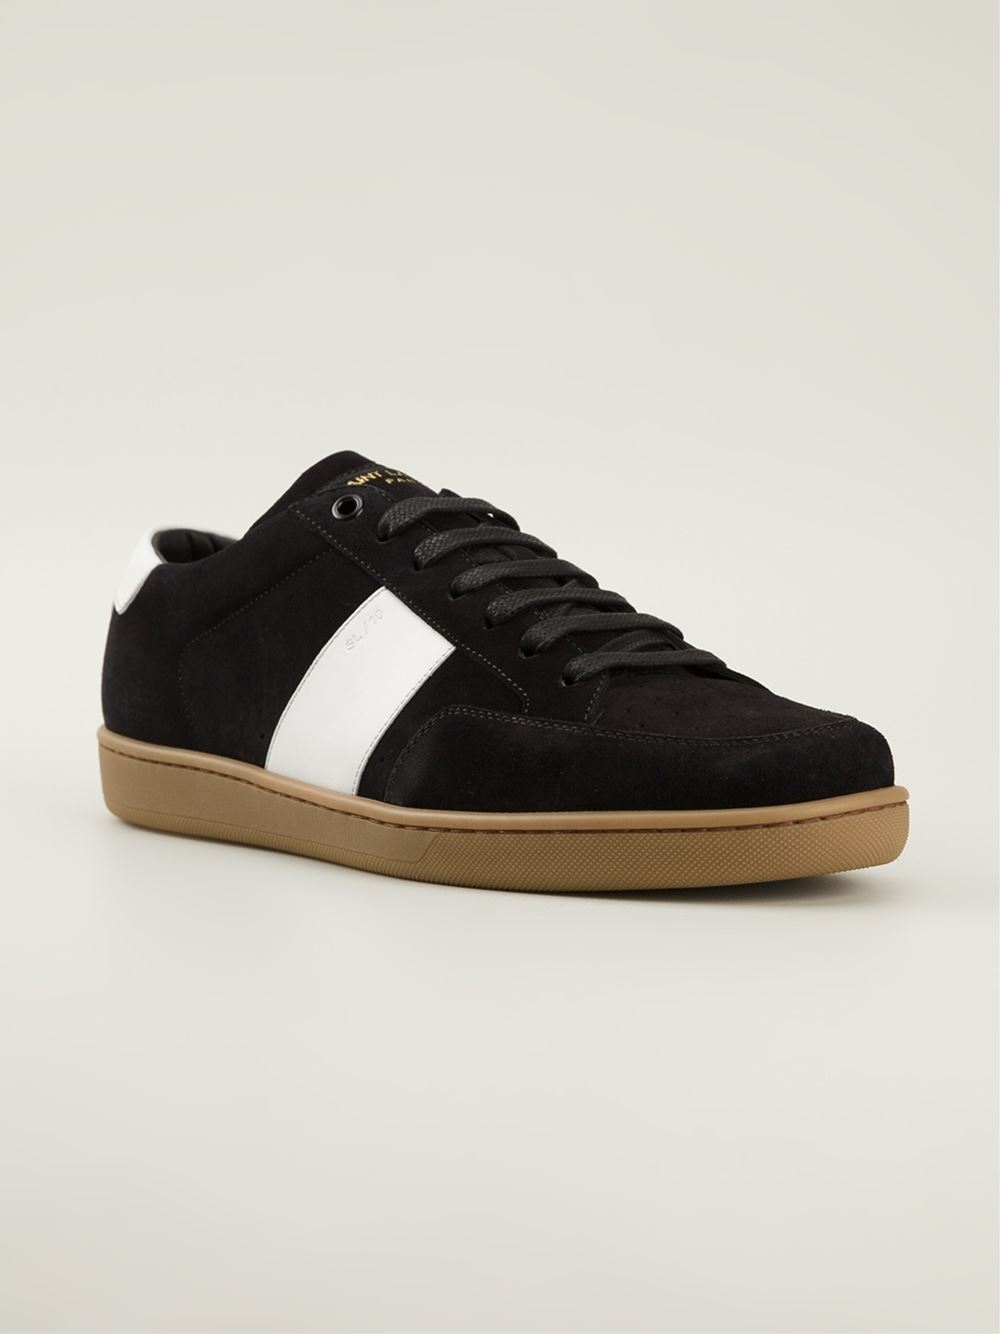 saint laurent low sneakers in black for men lyst. Black Bedroom Furniture Sets. Home Design Ideas